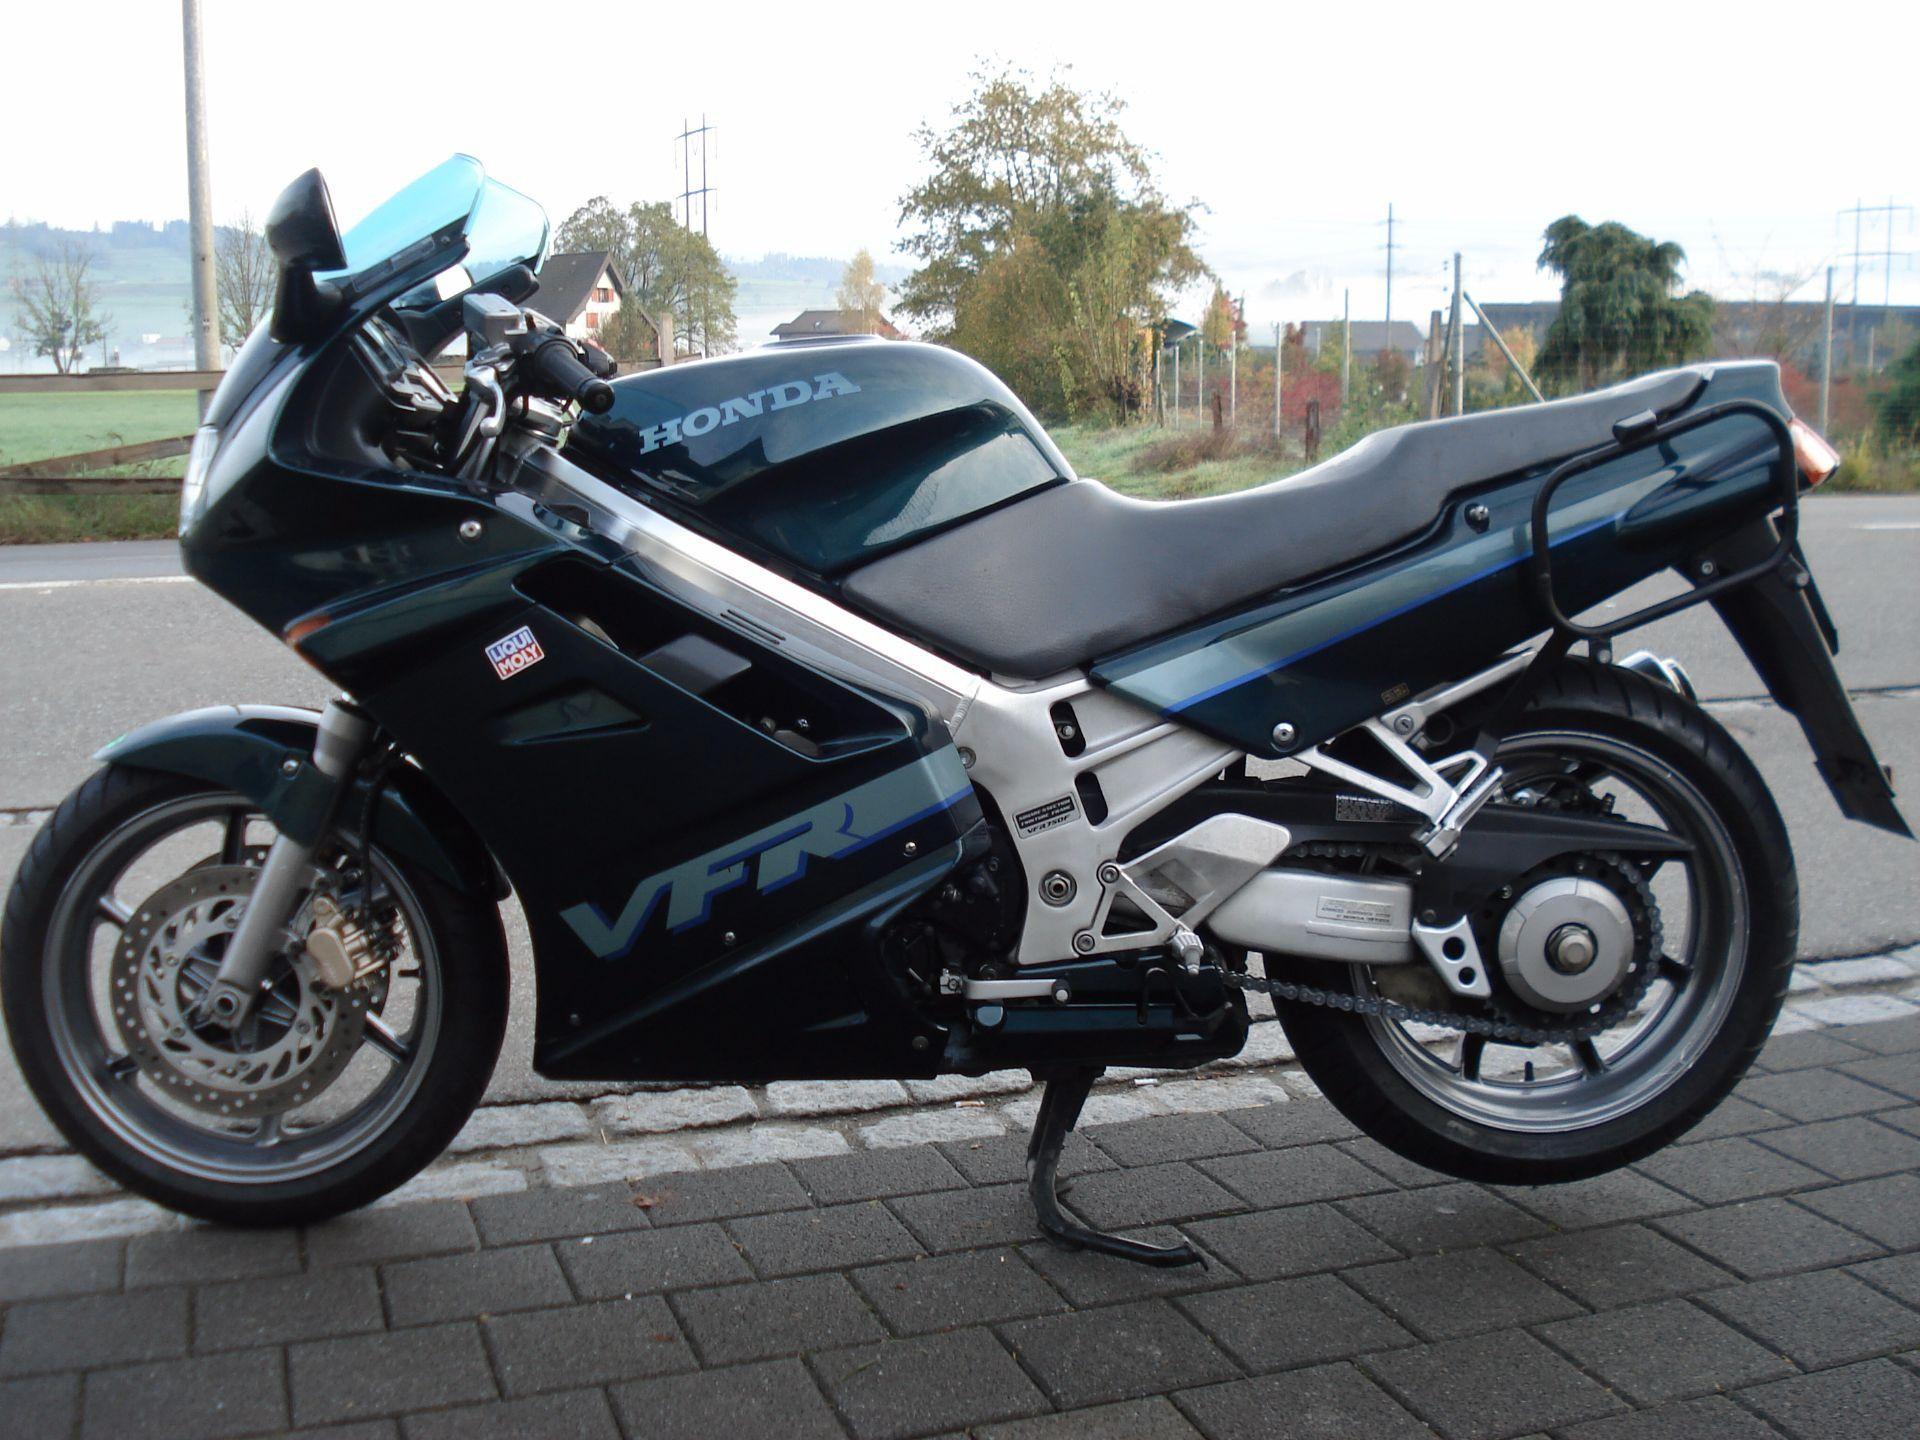 moto occasions acheter honda vfr 750 f janser bikes gmbh sch belbach. Black Bedroom Furniture Sets. Home Design Ideas